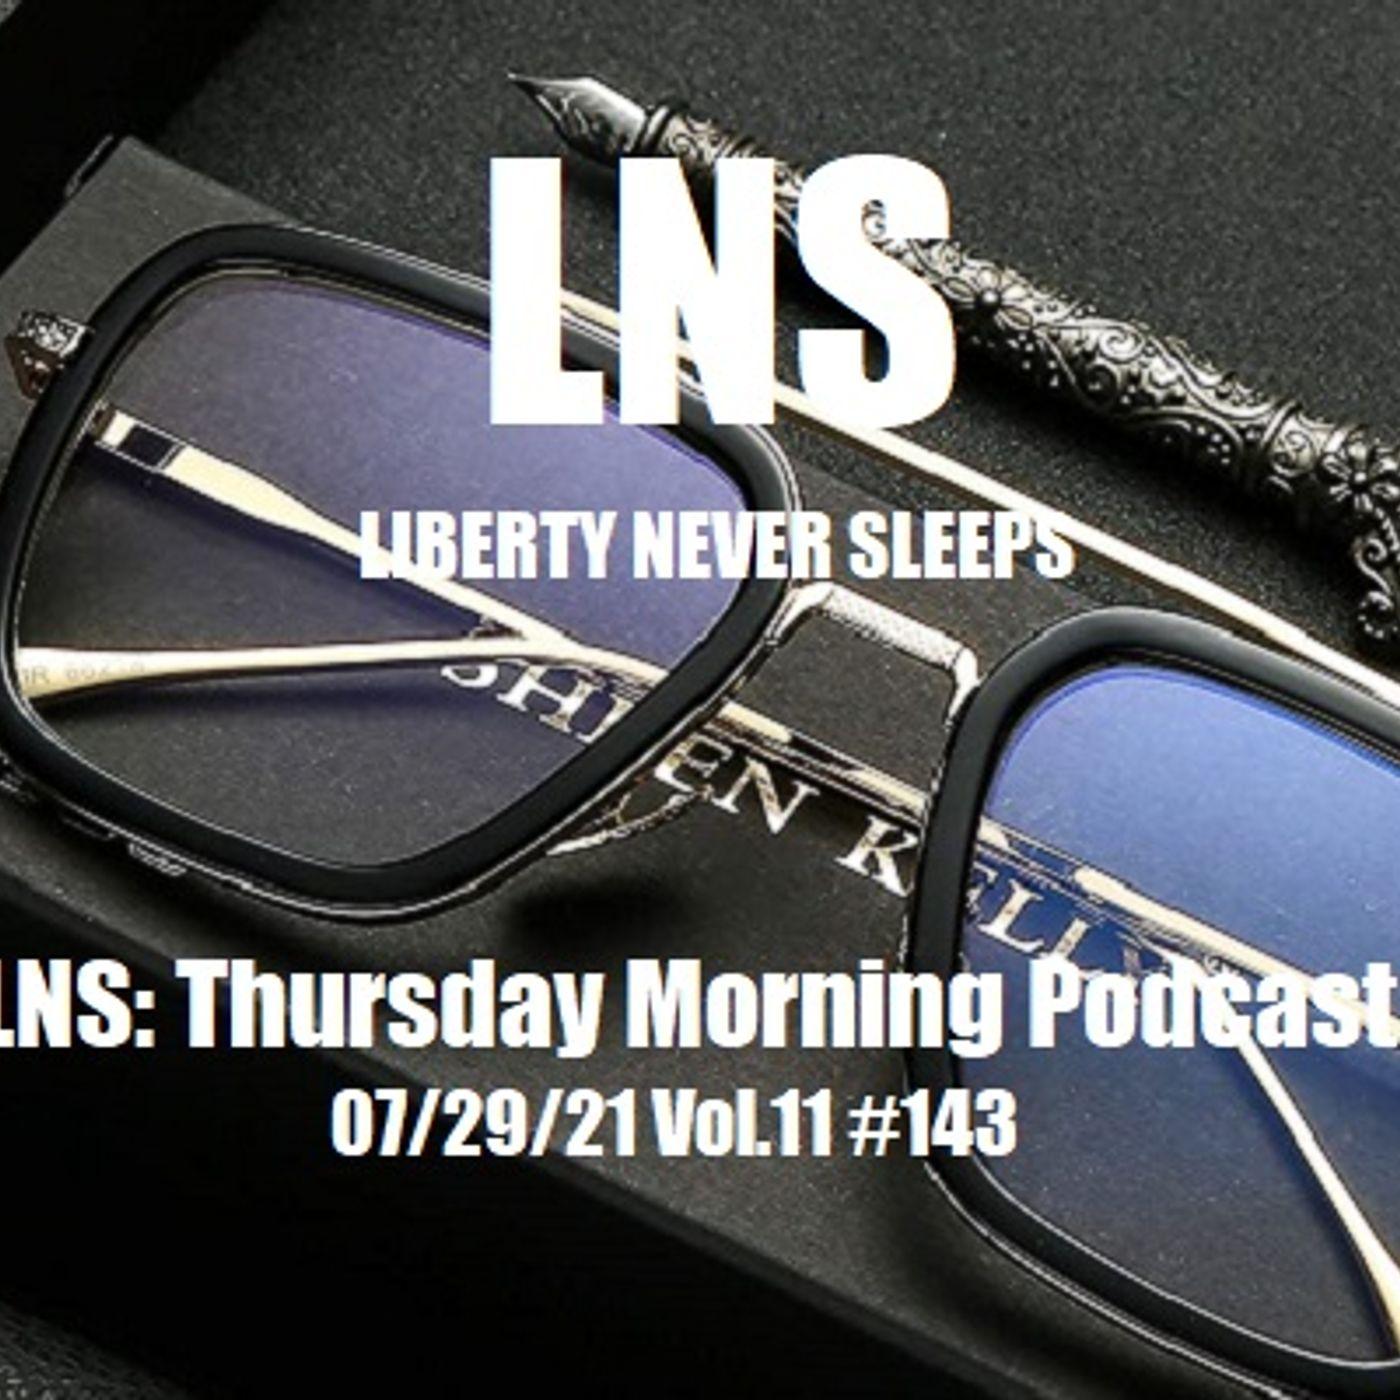 LNS: Thursday Morning Podcast 07/29/21 Vol.11 #143